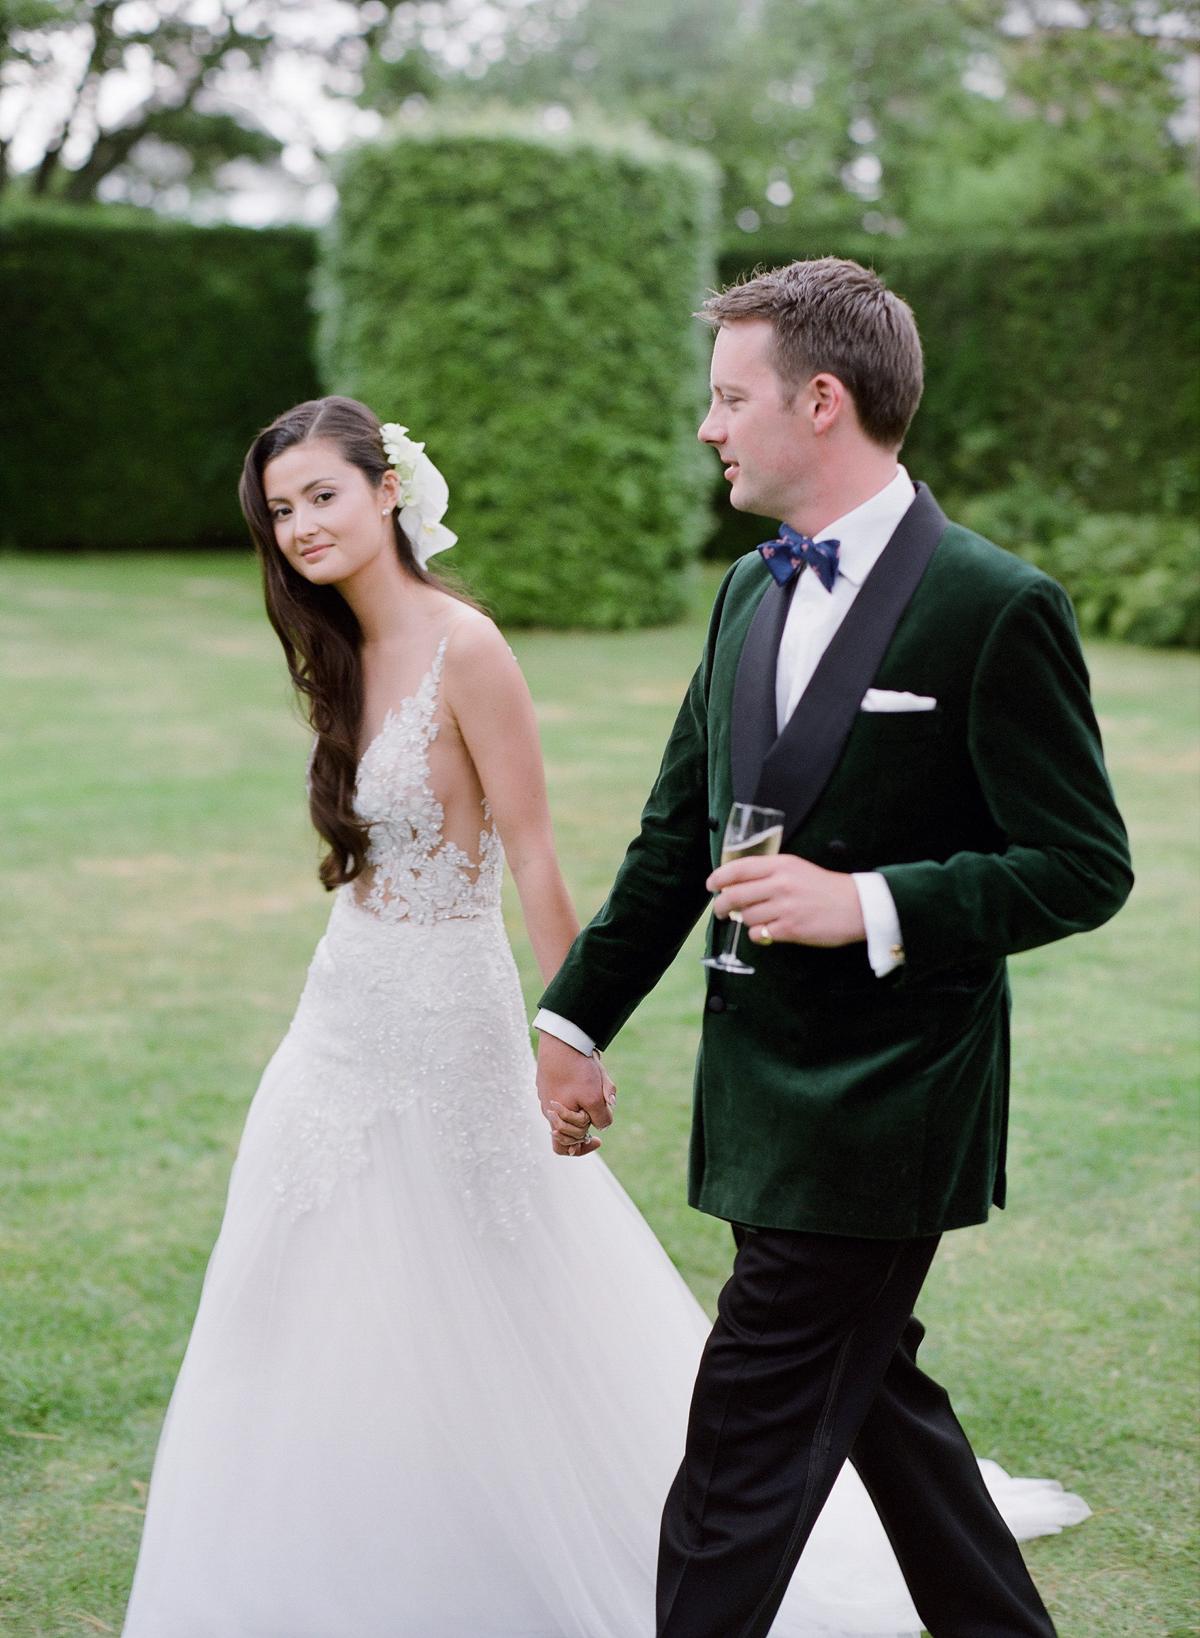 peony matthew england wedding couple in reception attire holding hands